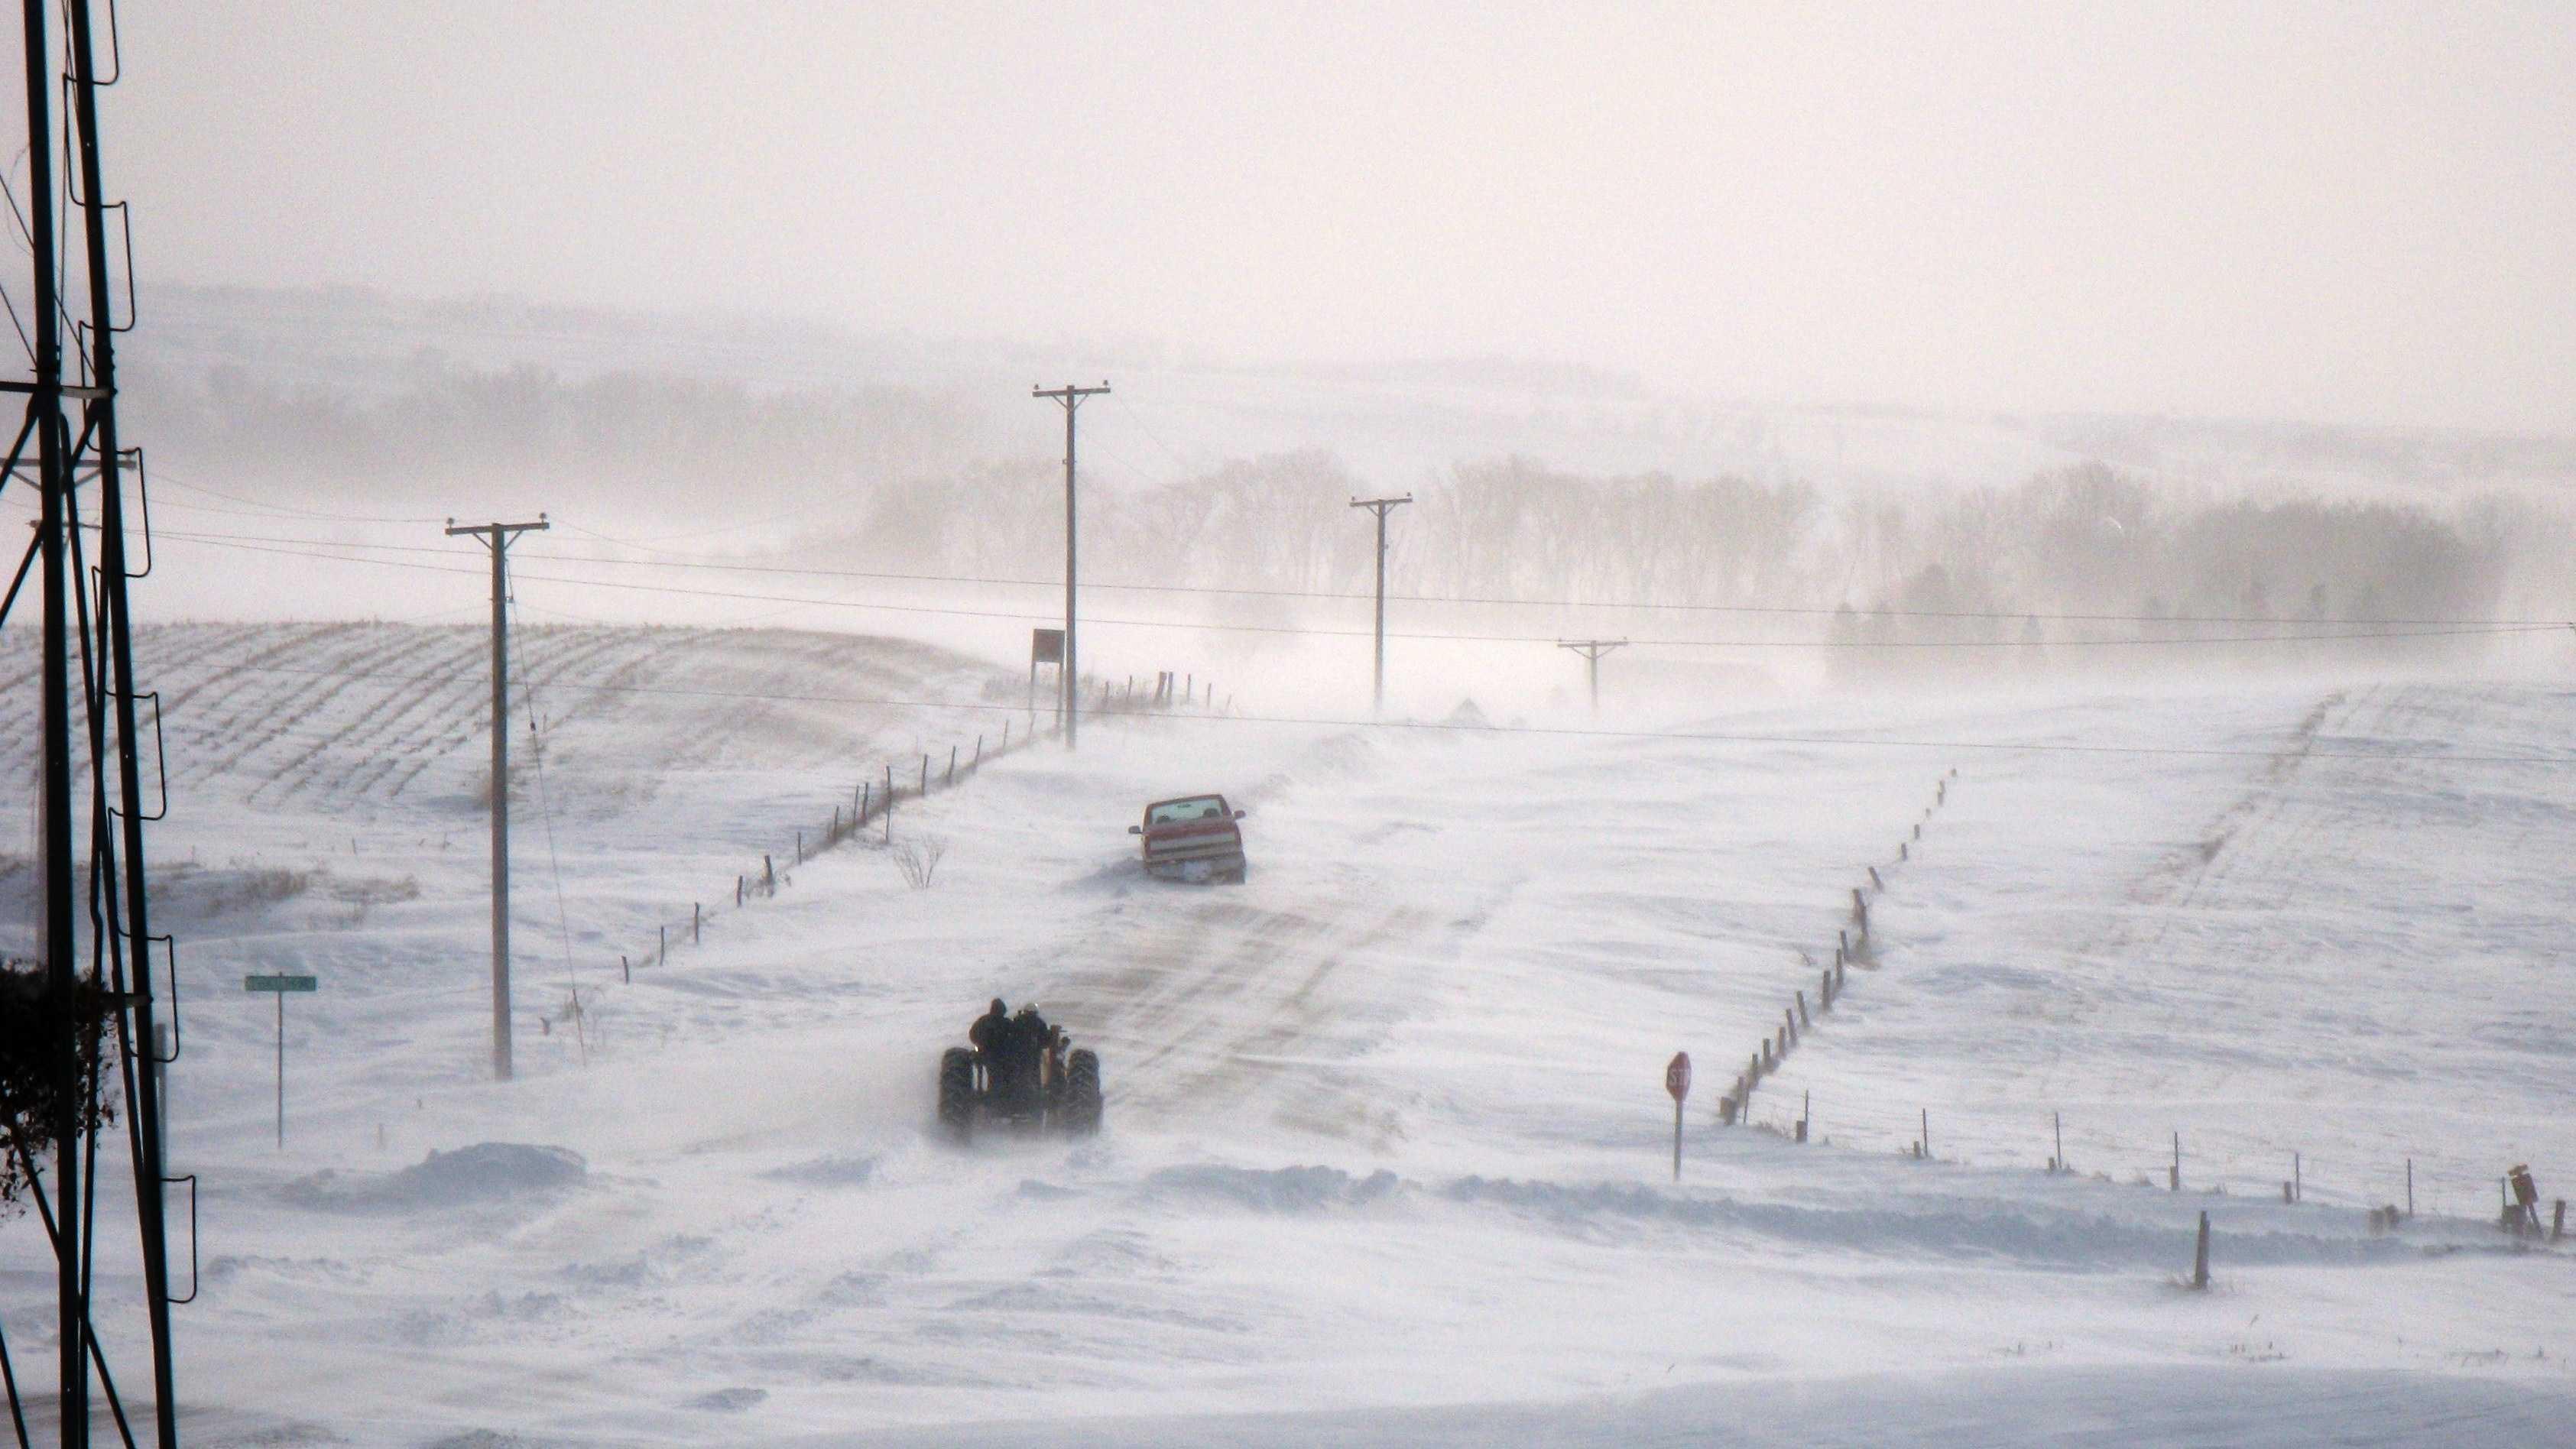 snow-ulocal-121912.jpg